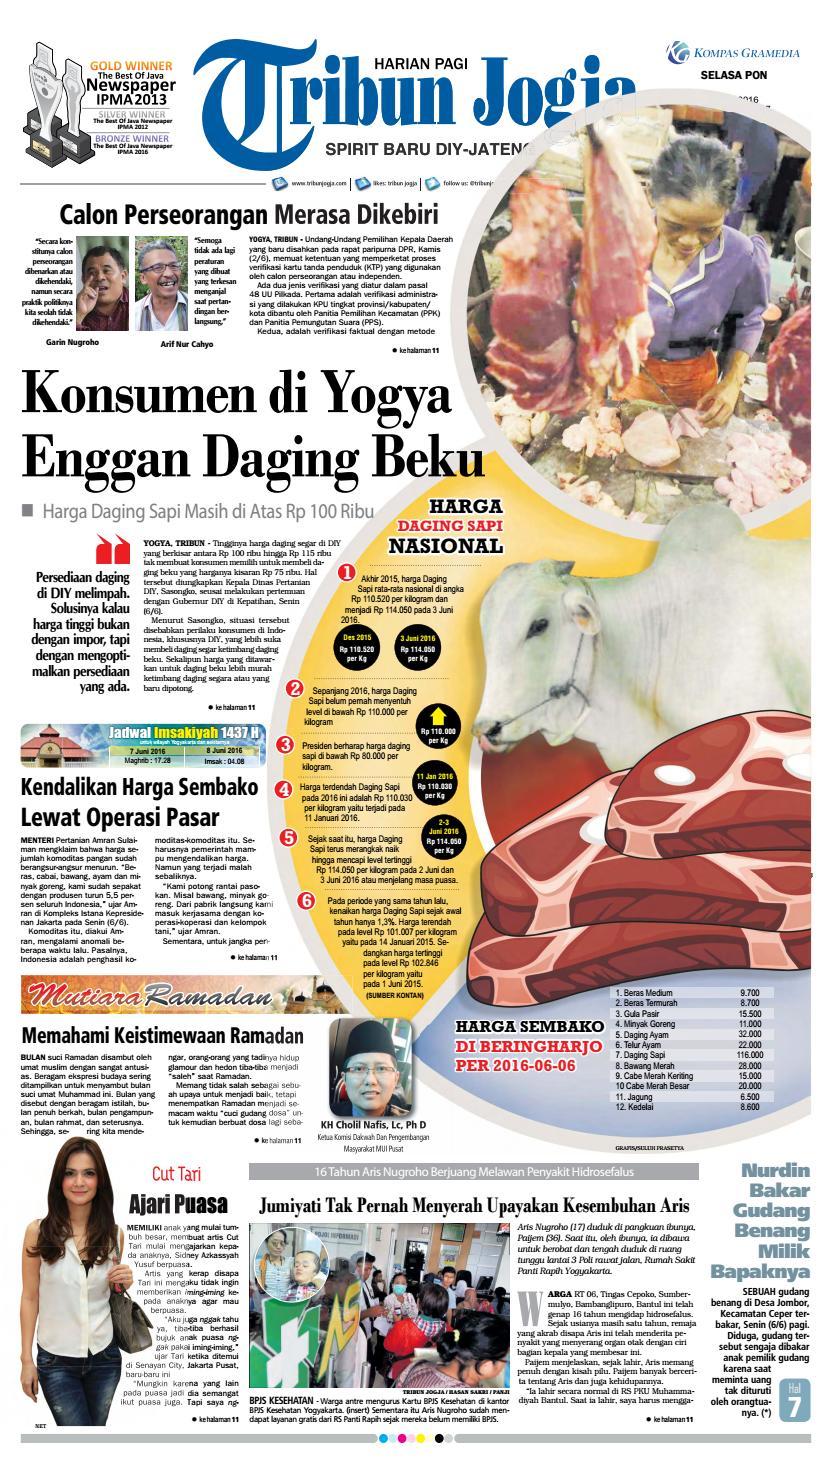 Tribunjogja 07 06 2016 By Tribun Jogja Issuu Produk Ukm Bumn Bale Sehat Teh Rosella Merah 3 Box